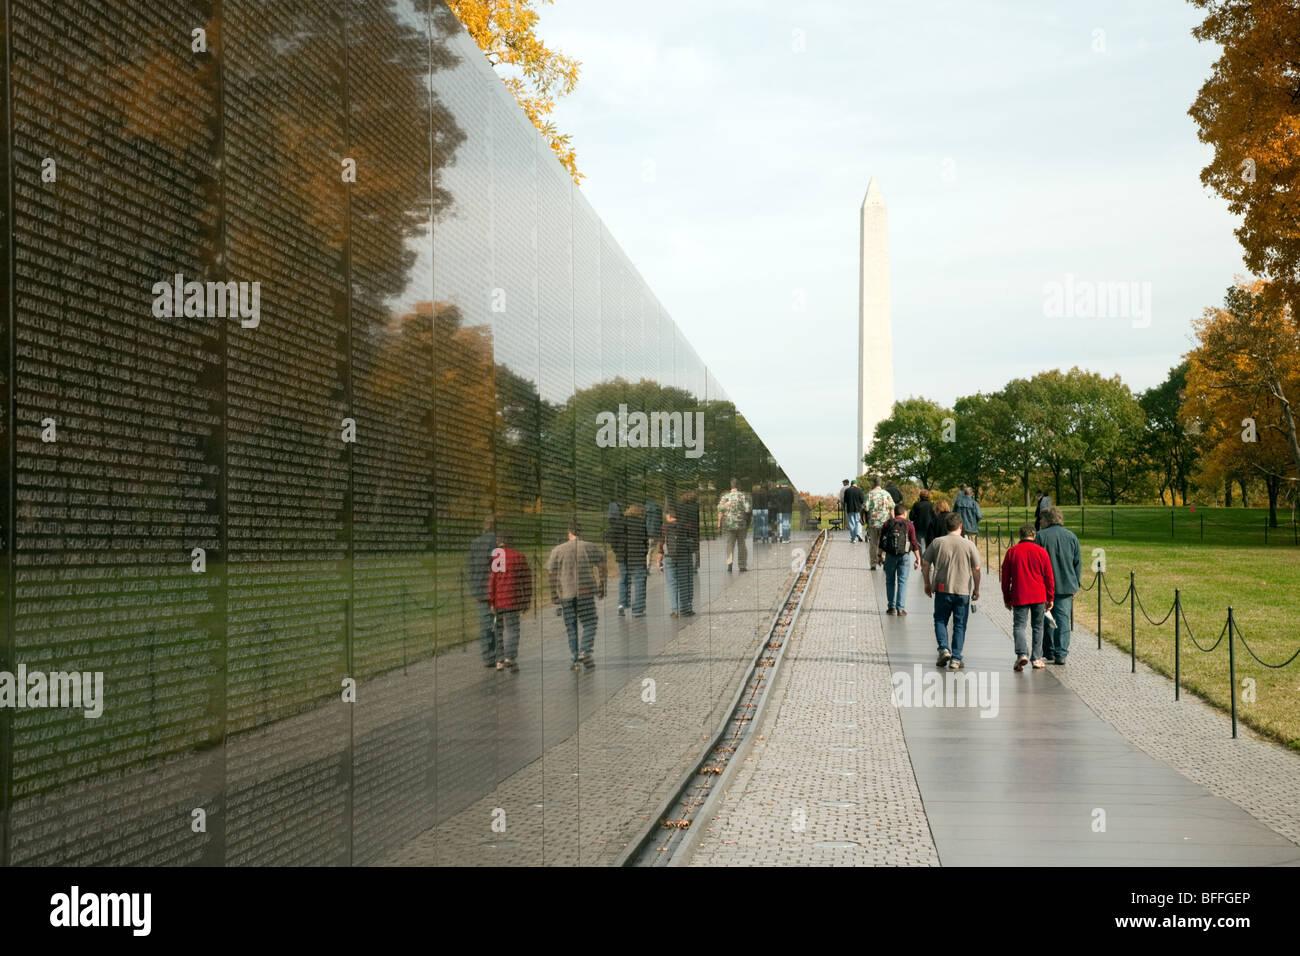 Visitors at the Vietnam Veterans War Memorial, Washington DC USA - Stock Image